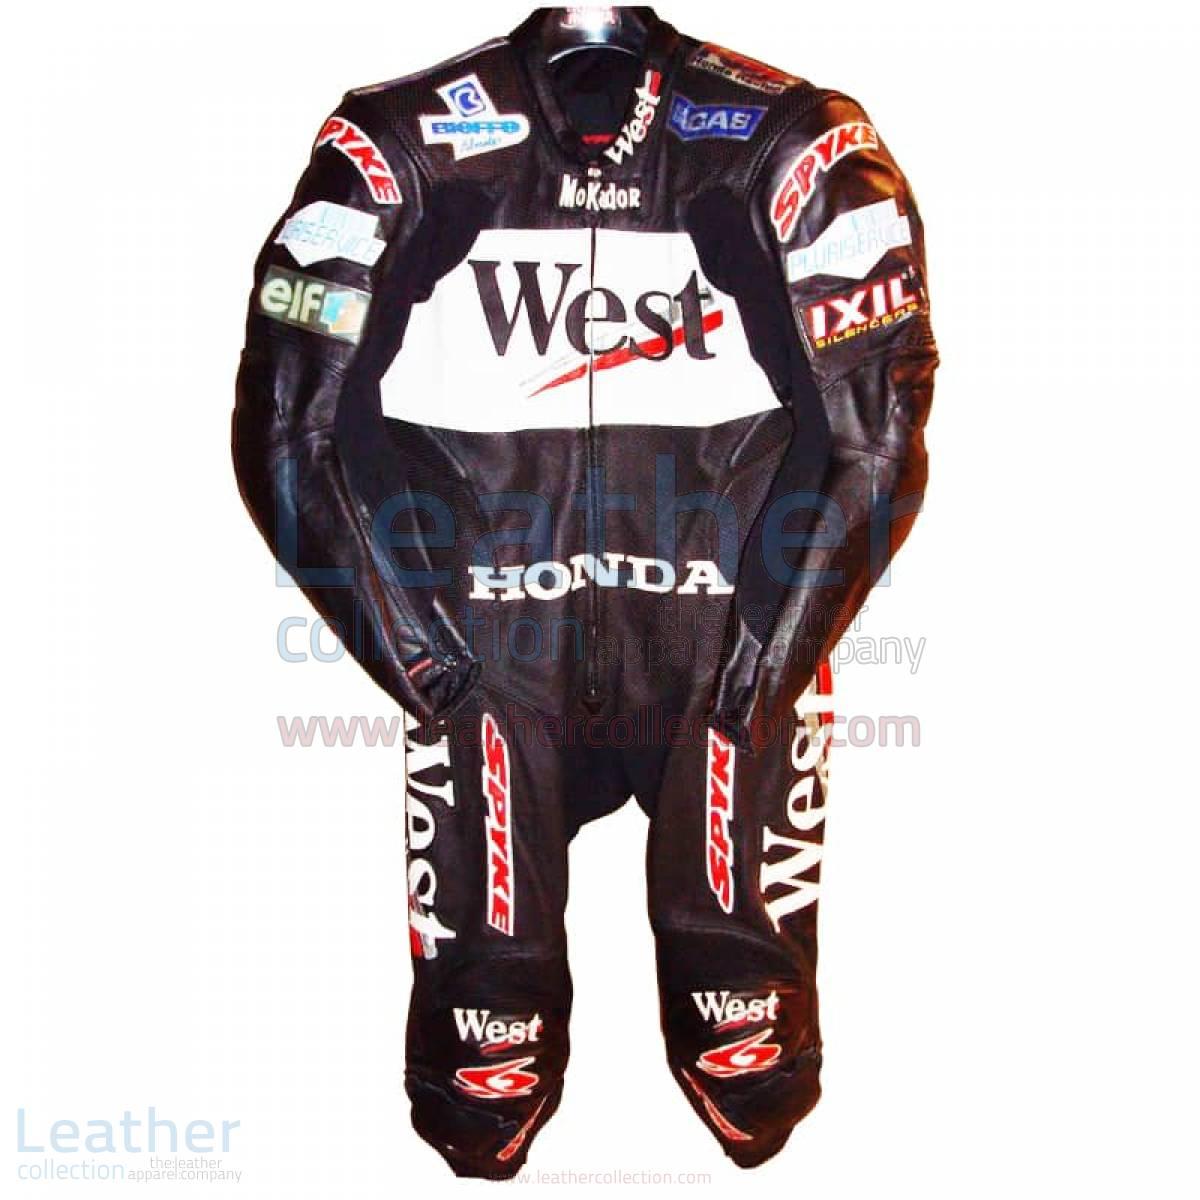 Loris Capirossi Honda GP 2001 Motorcycle Leathers